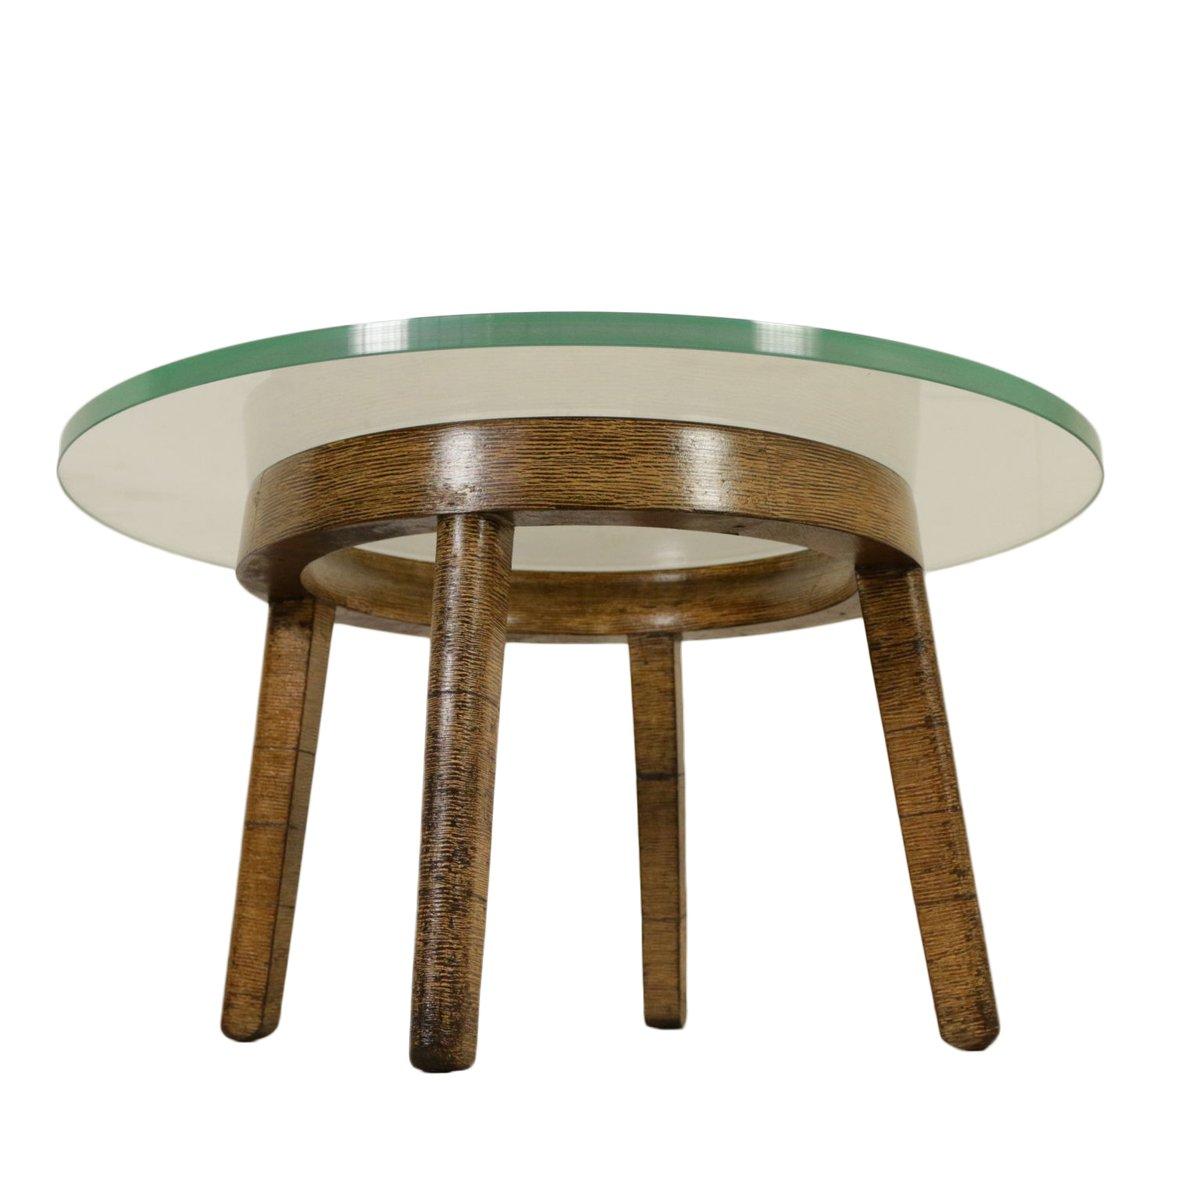 table basse vintage en bois d coratif verre en vente sur pamono. Black Bedroom Furniture Sets. Home Design Ideas